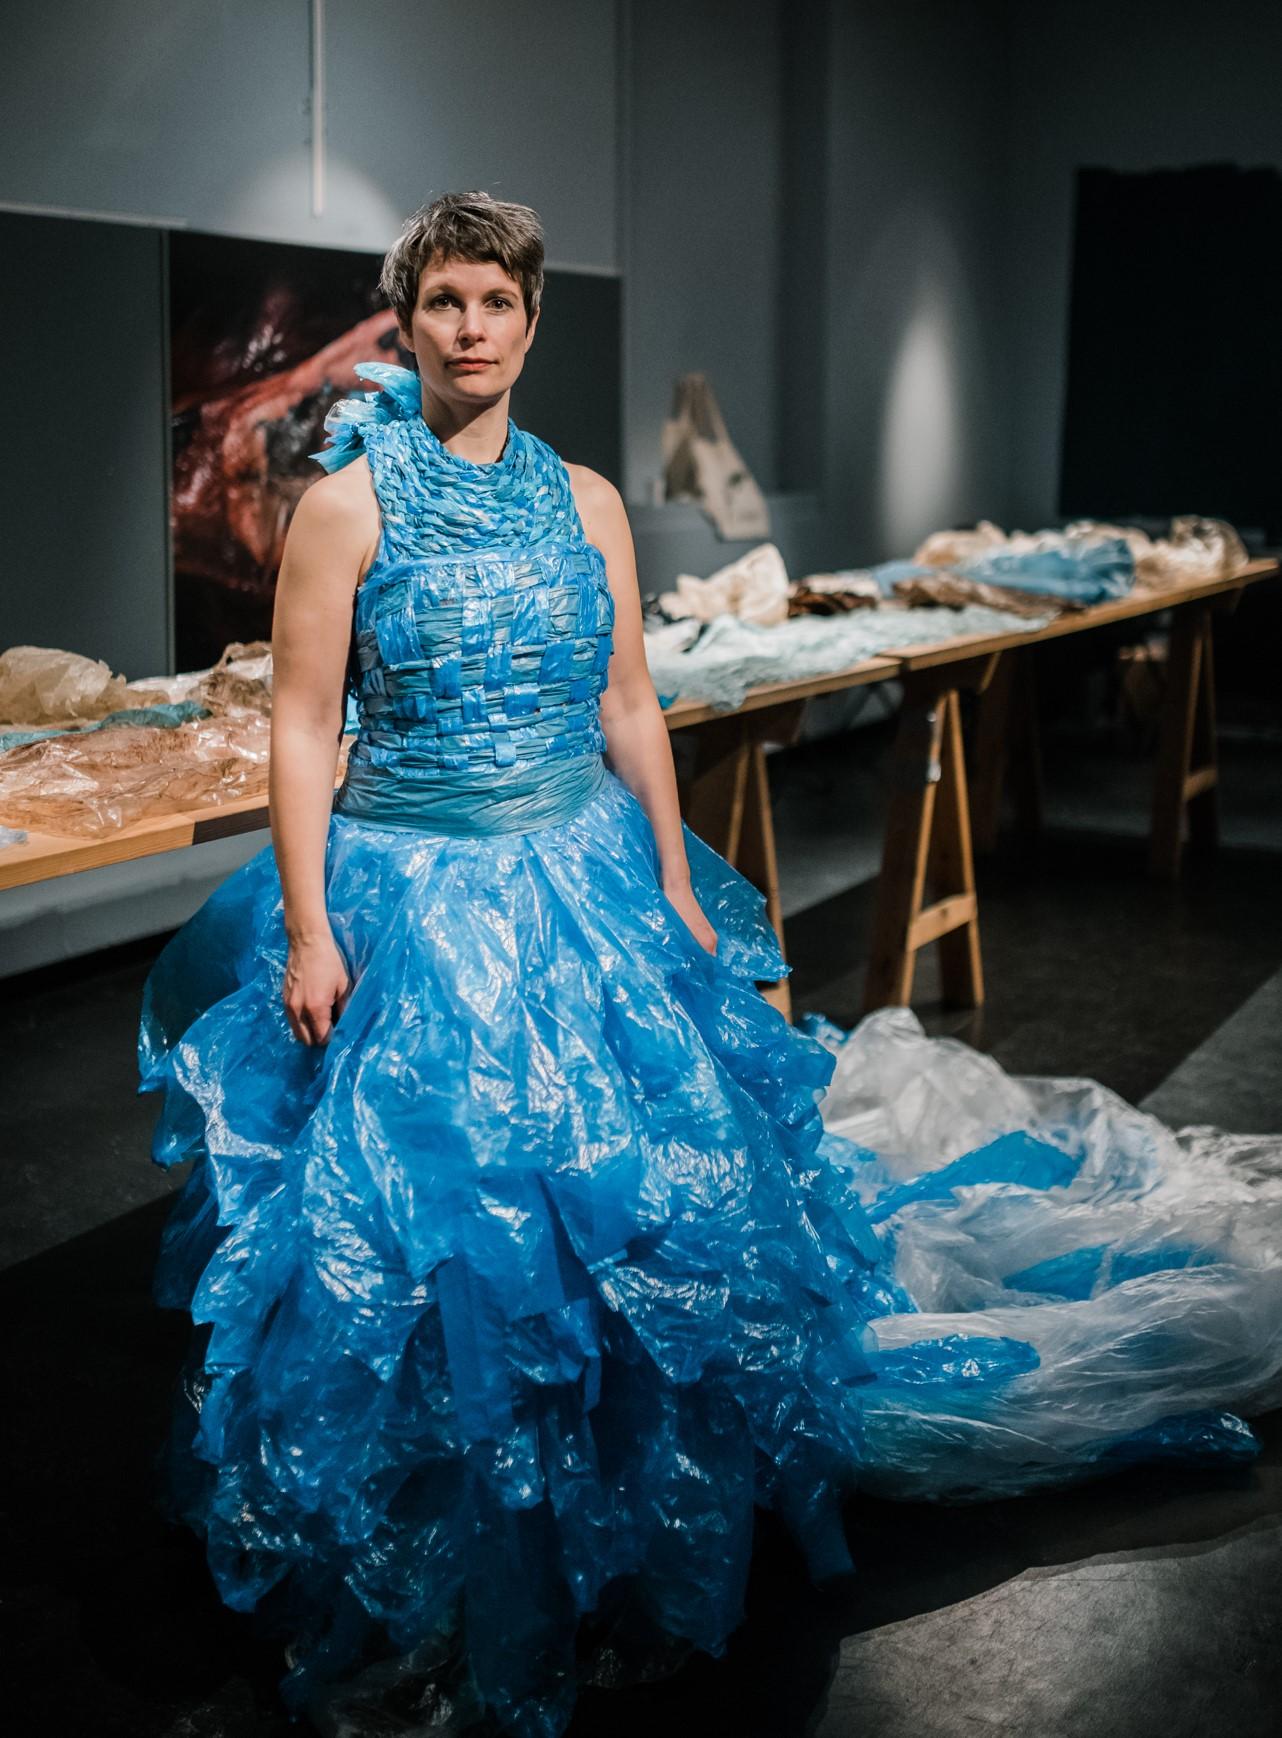 Bodil Lunde Rørtveit på Universitetsmuseet i Bergen foran plasten som ble funnet i #plasthvalen på Sotra våren 2017. Foto: Cecilie Bannow